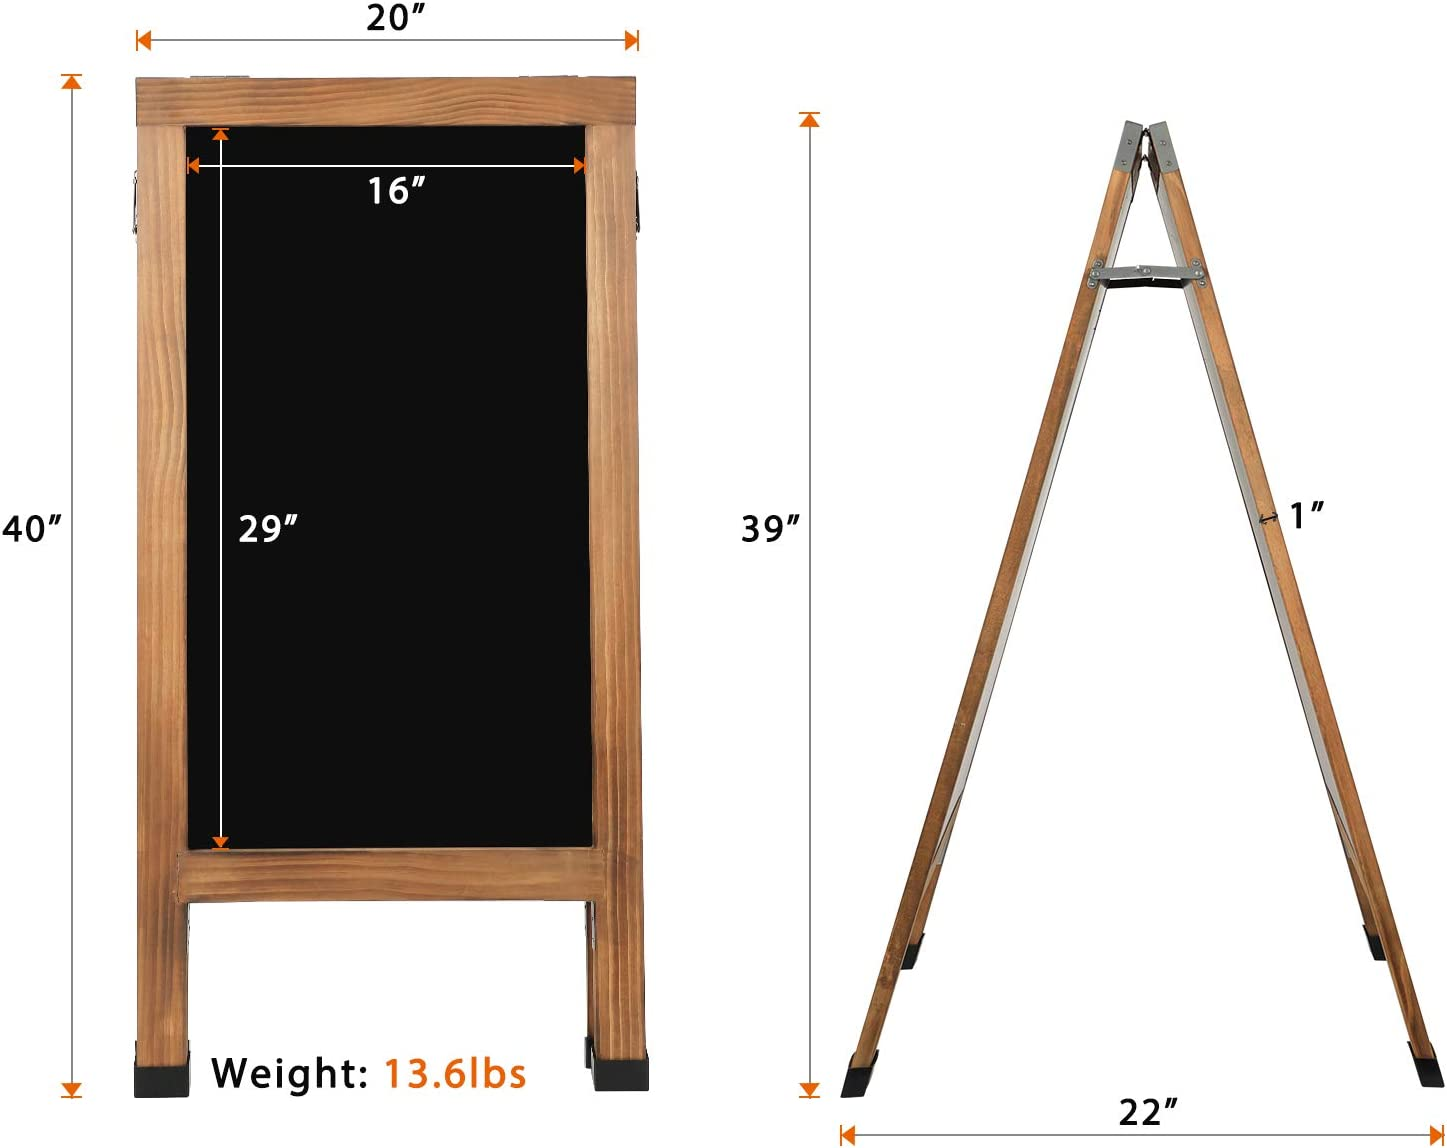 ORIENGEAR 40 x 20 Inches A Frame Chalkboard Sign Large Sturdy Wooden Display Sidewalk Chalkboard Sign Sandwich Board